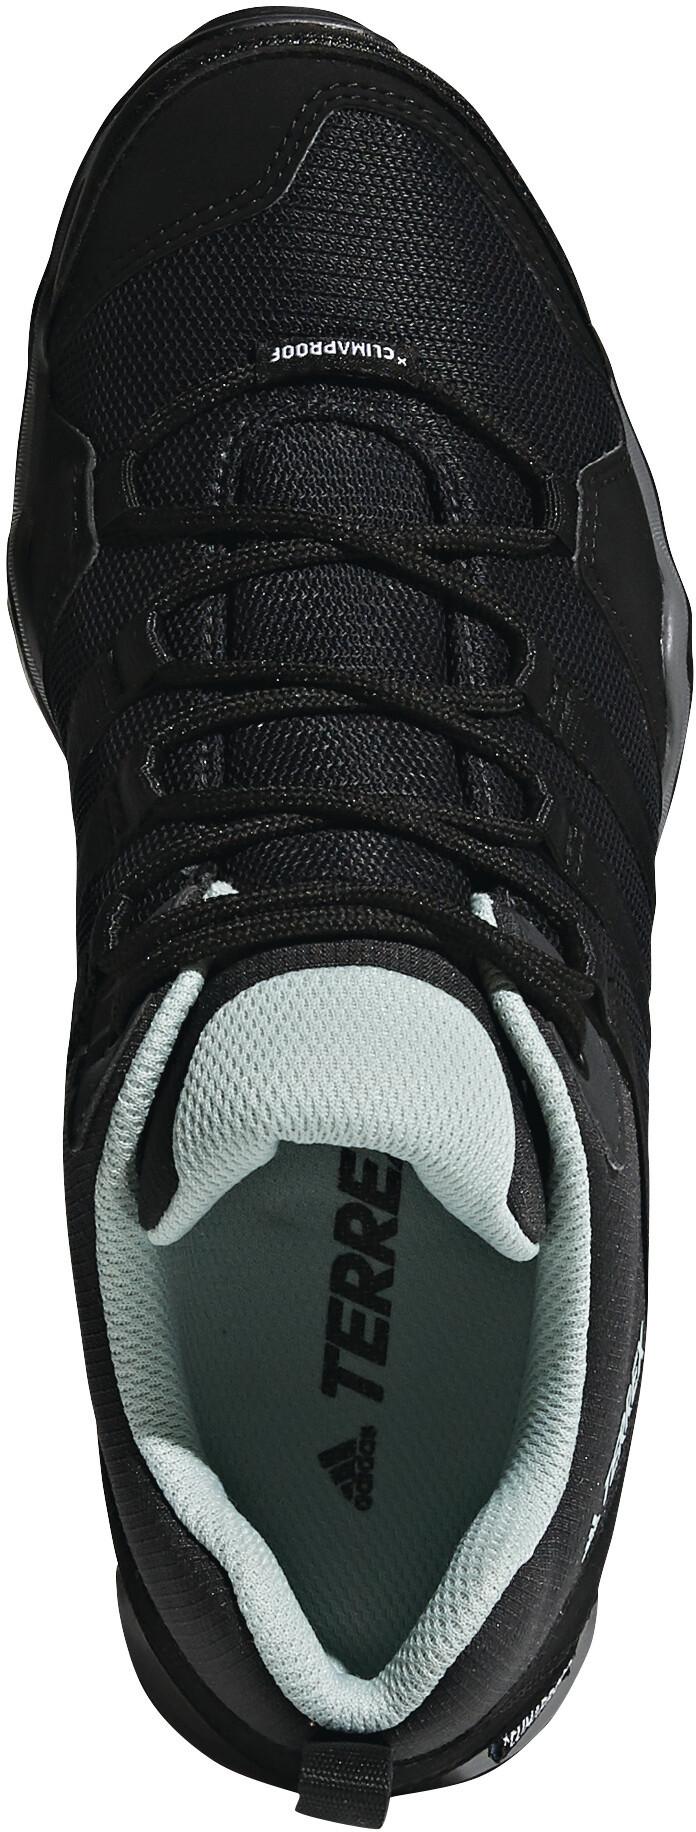 Zapatillas adidas Terrex AX2 Climaproof gris oscuro negro mujer